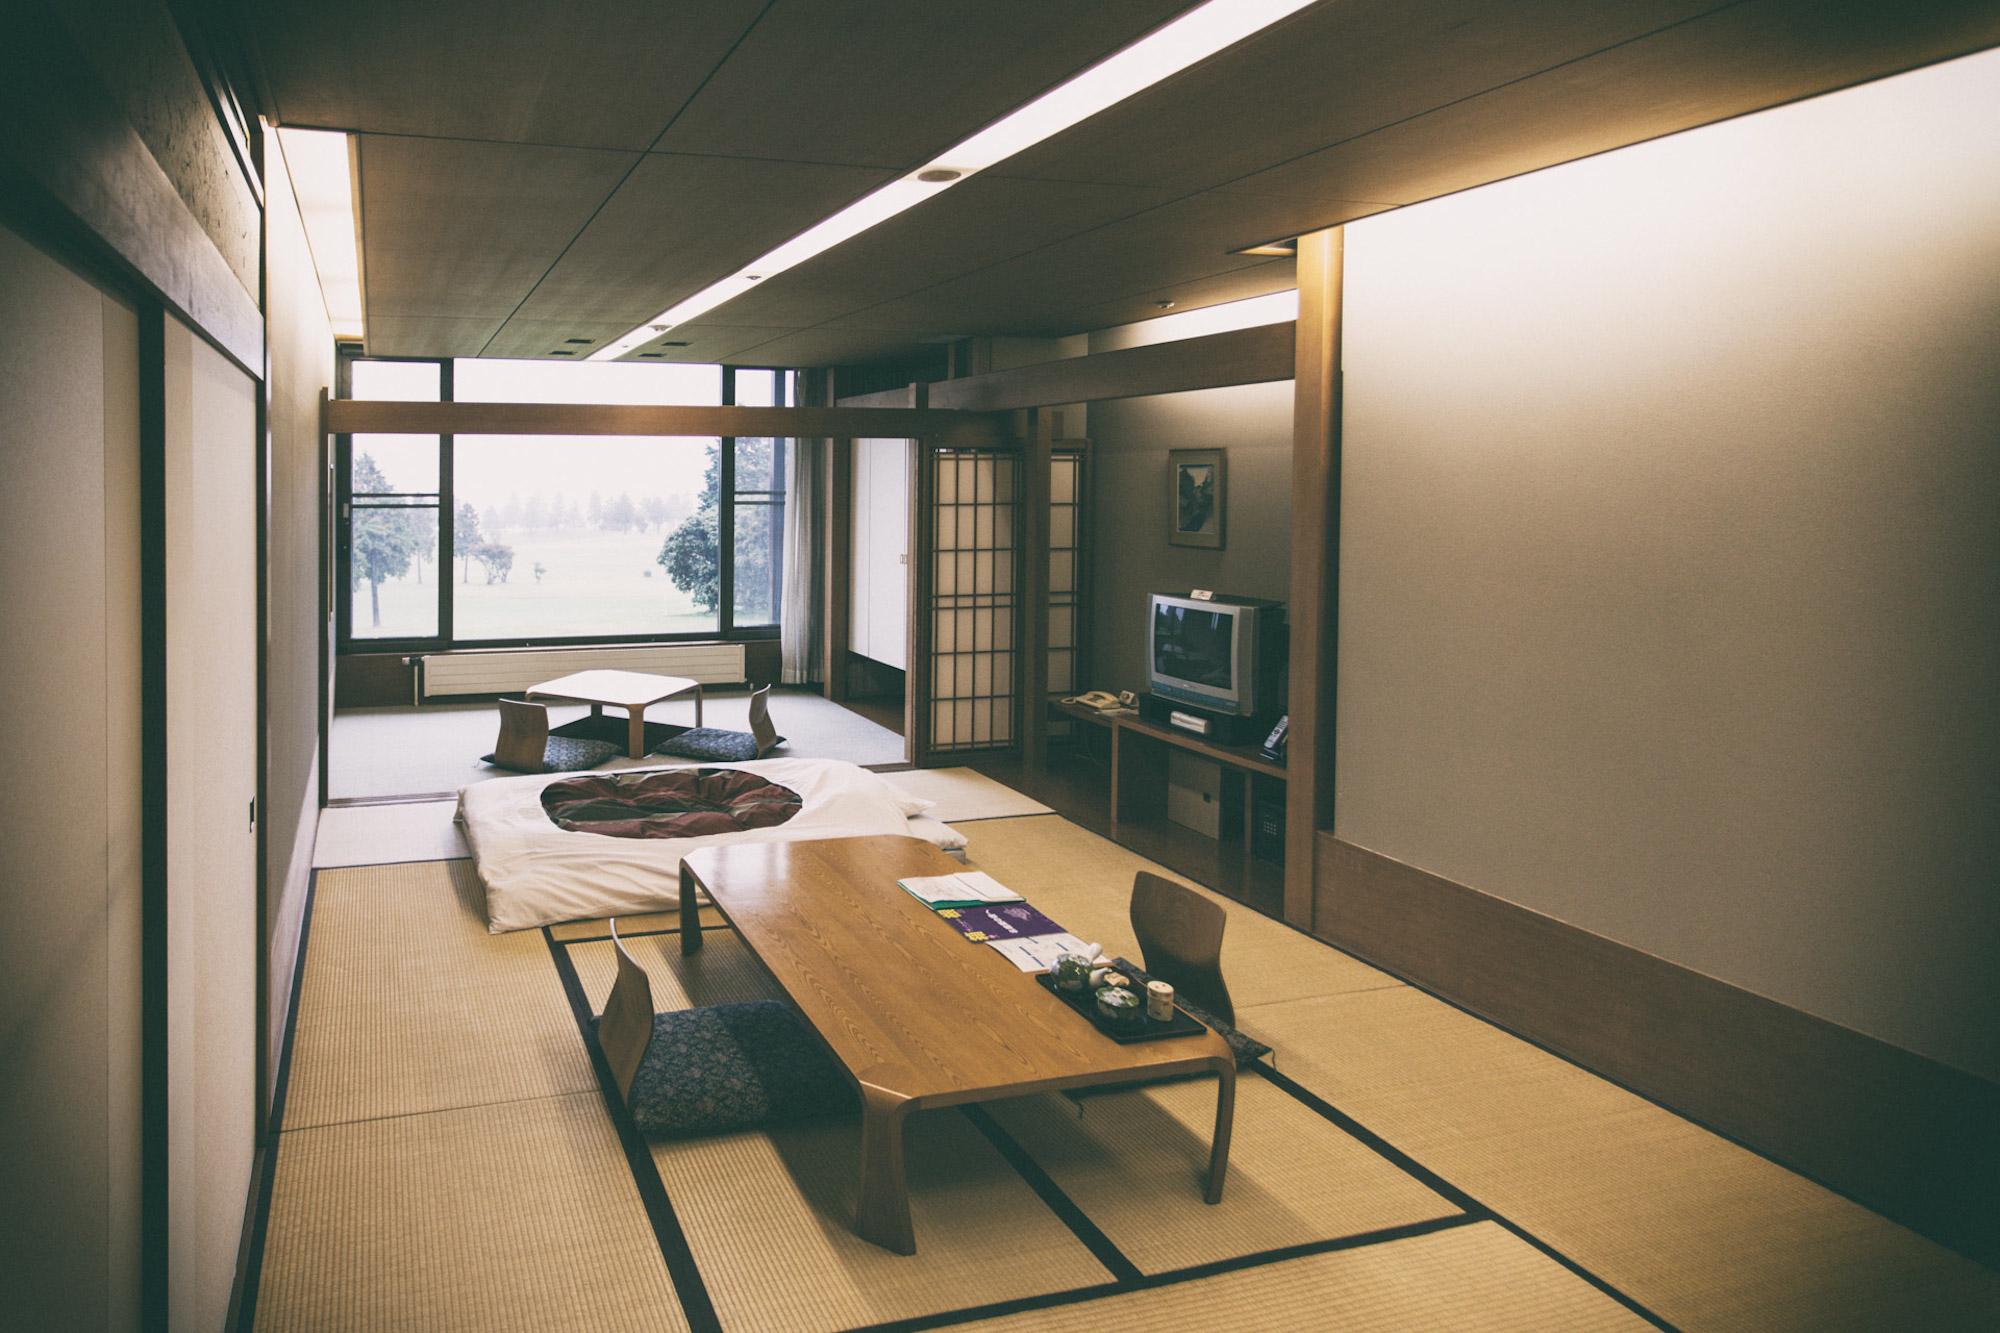 10 best pancake restaurants in tokyo you must visit hub for Design hotel tokyo